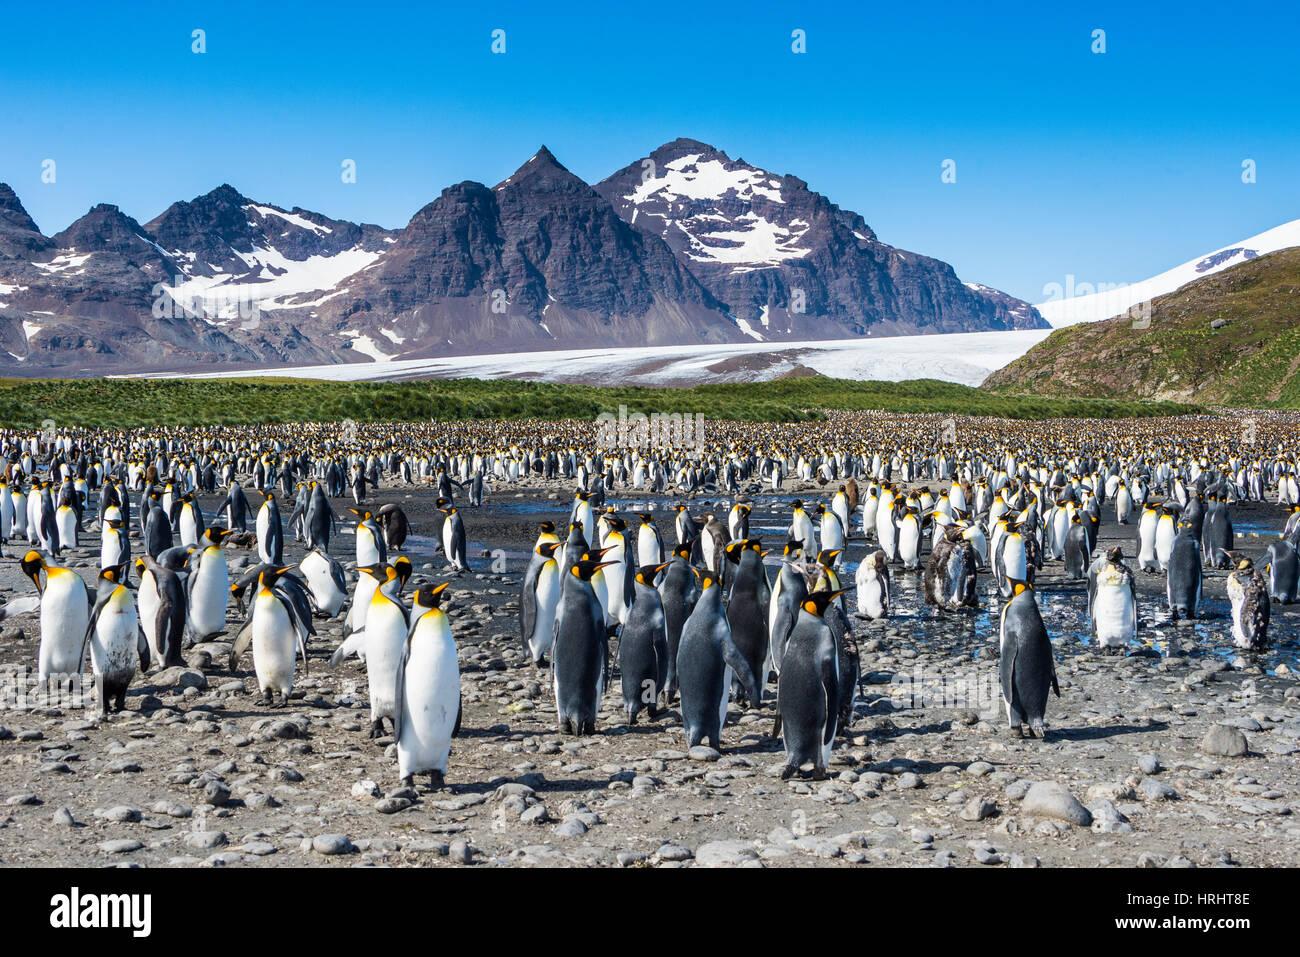 Giant king penguin (Aptenodytes patagonicus) colony, Salisbury Plain, South Georgia, Antarctica, Polar Regions Stock Photo